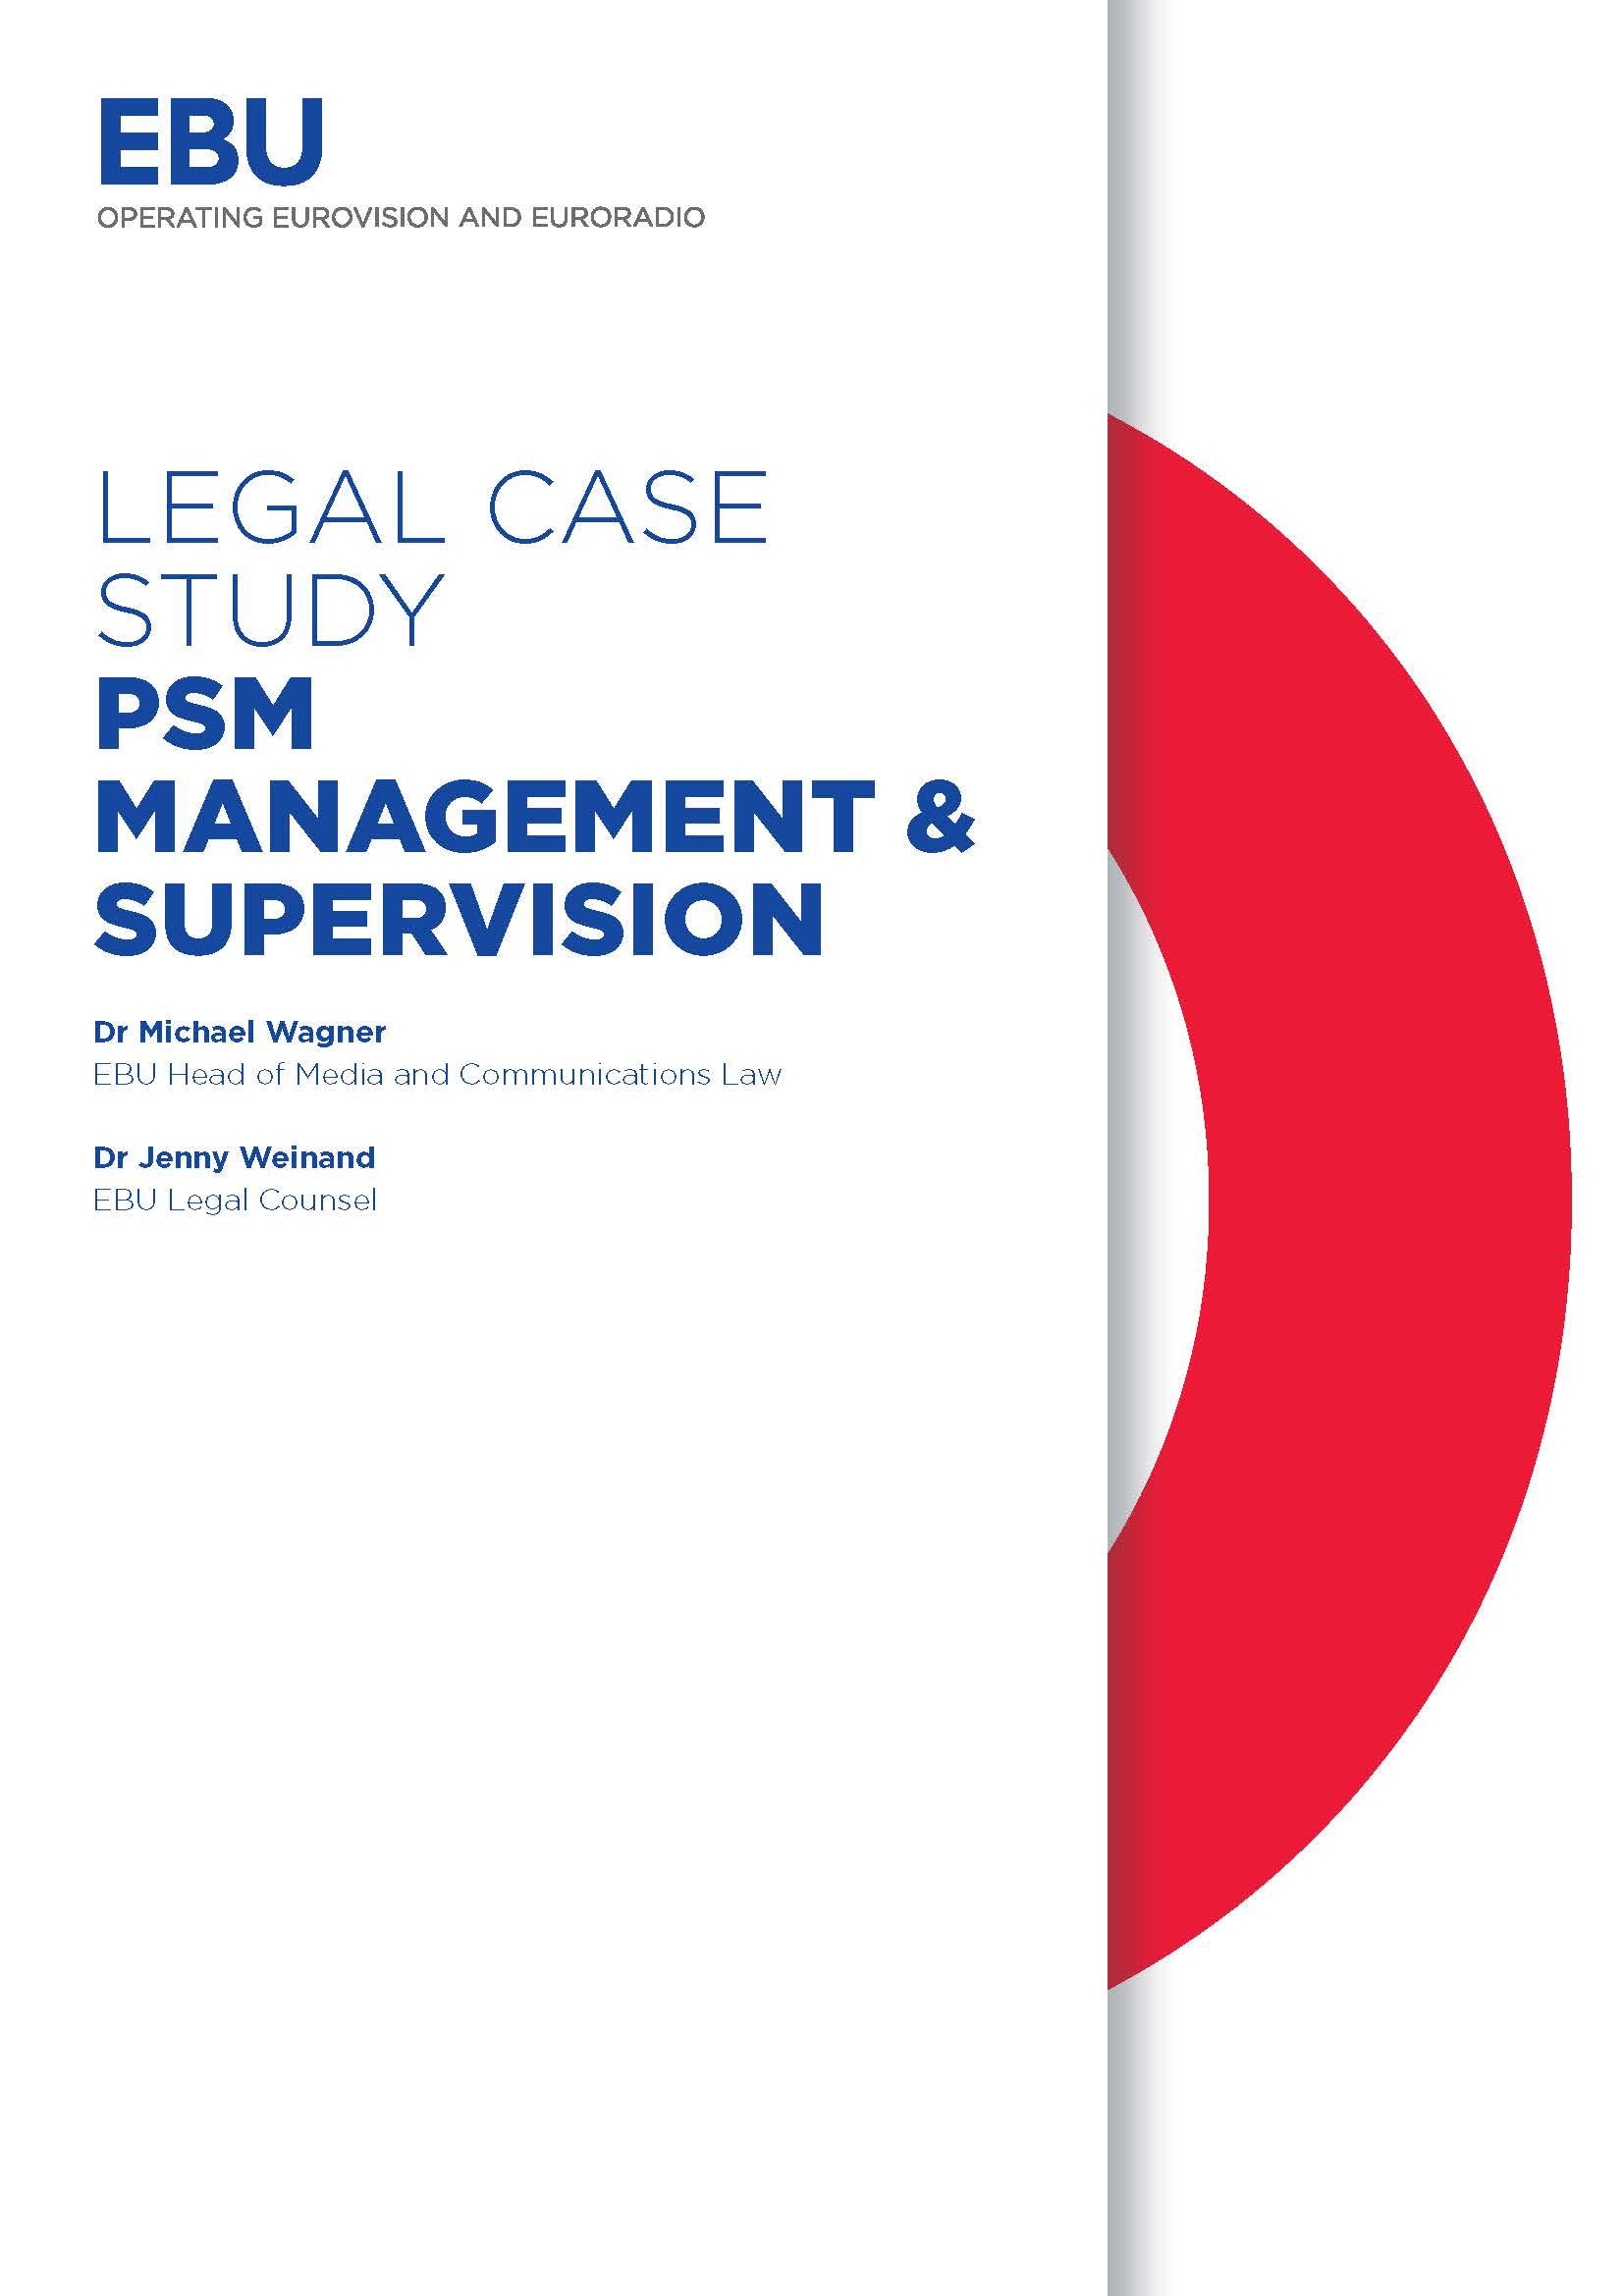 EBU - Legal Case Study: PSM Management & Supervision